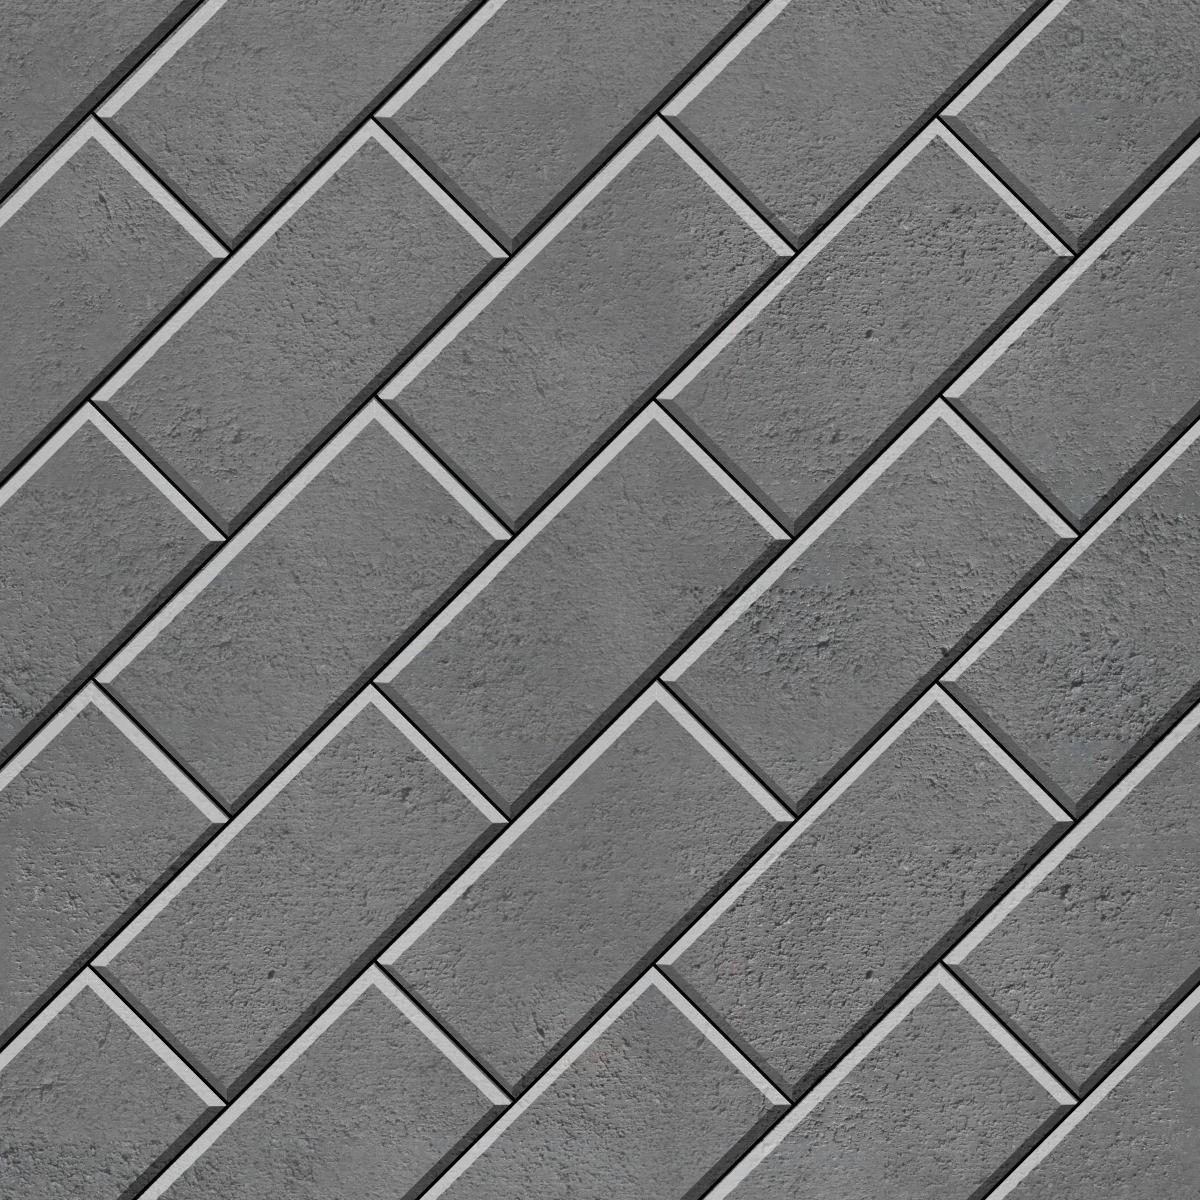 45 Stretcher Bond (rectangle) Grey1200